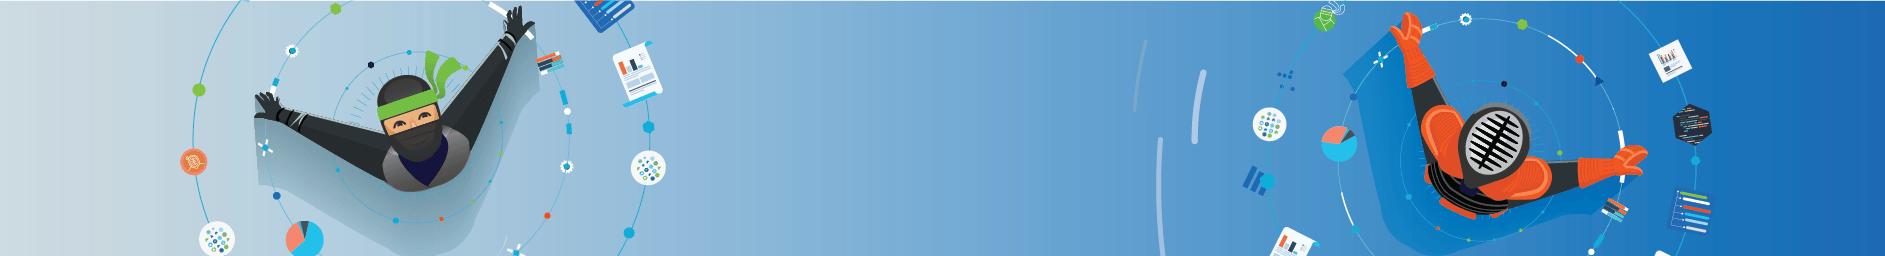 Telerik and Kendo UI R3 2018 Release Cover Image